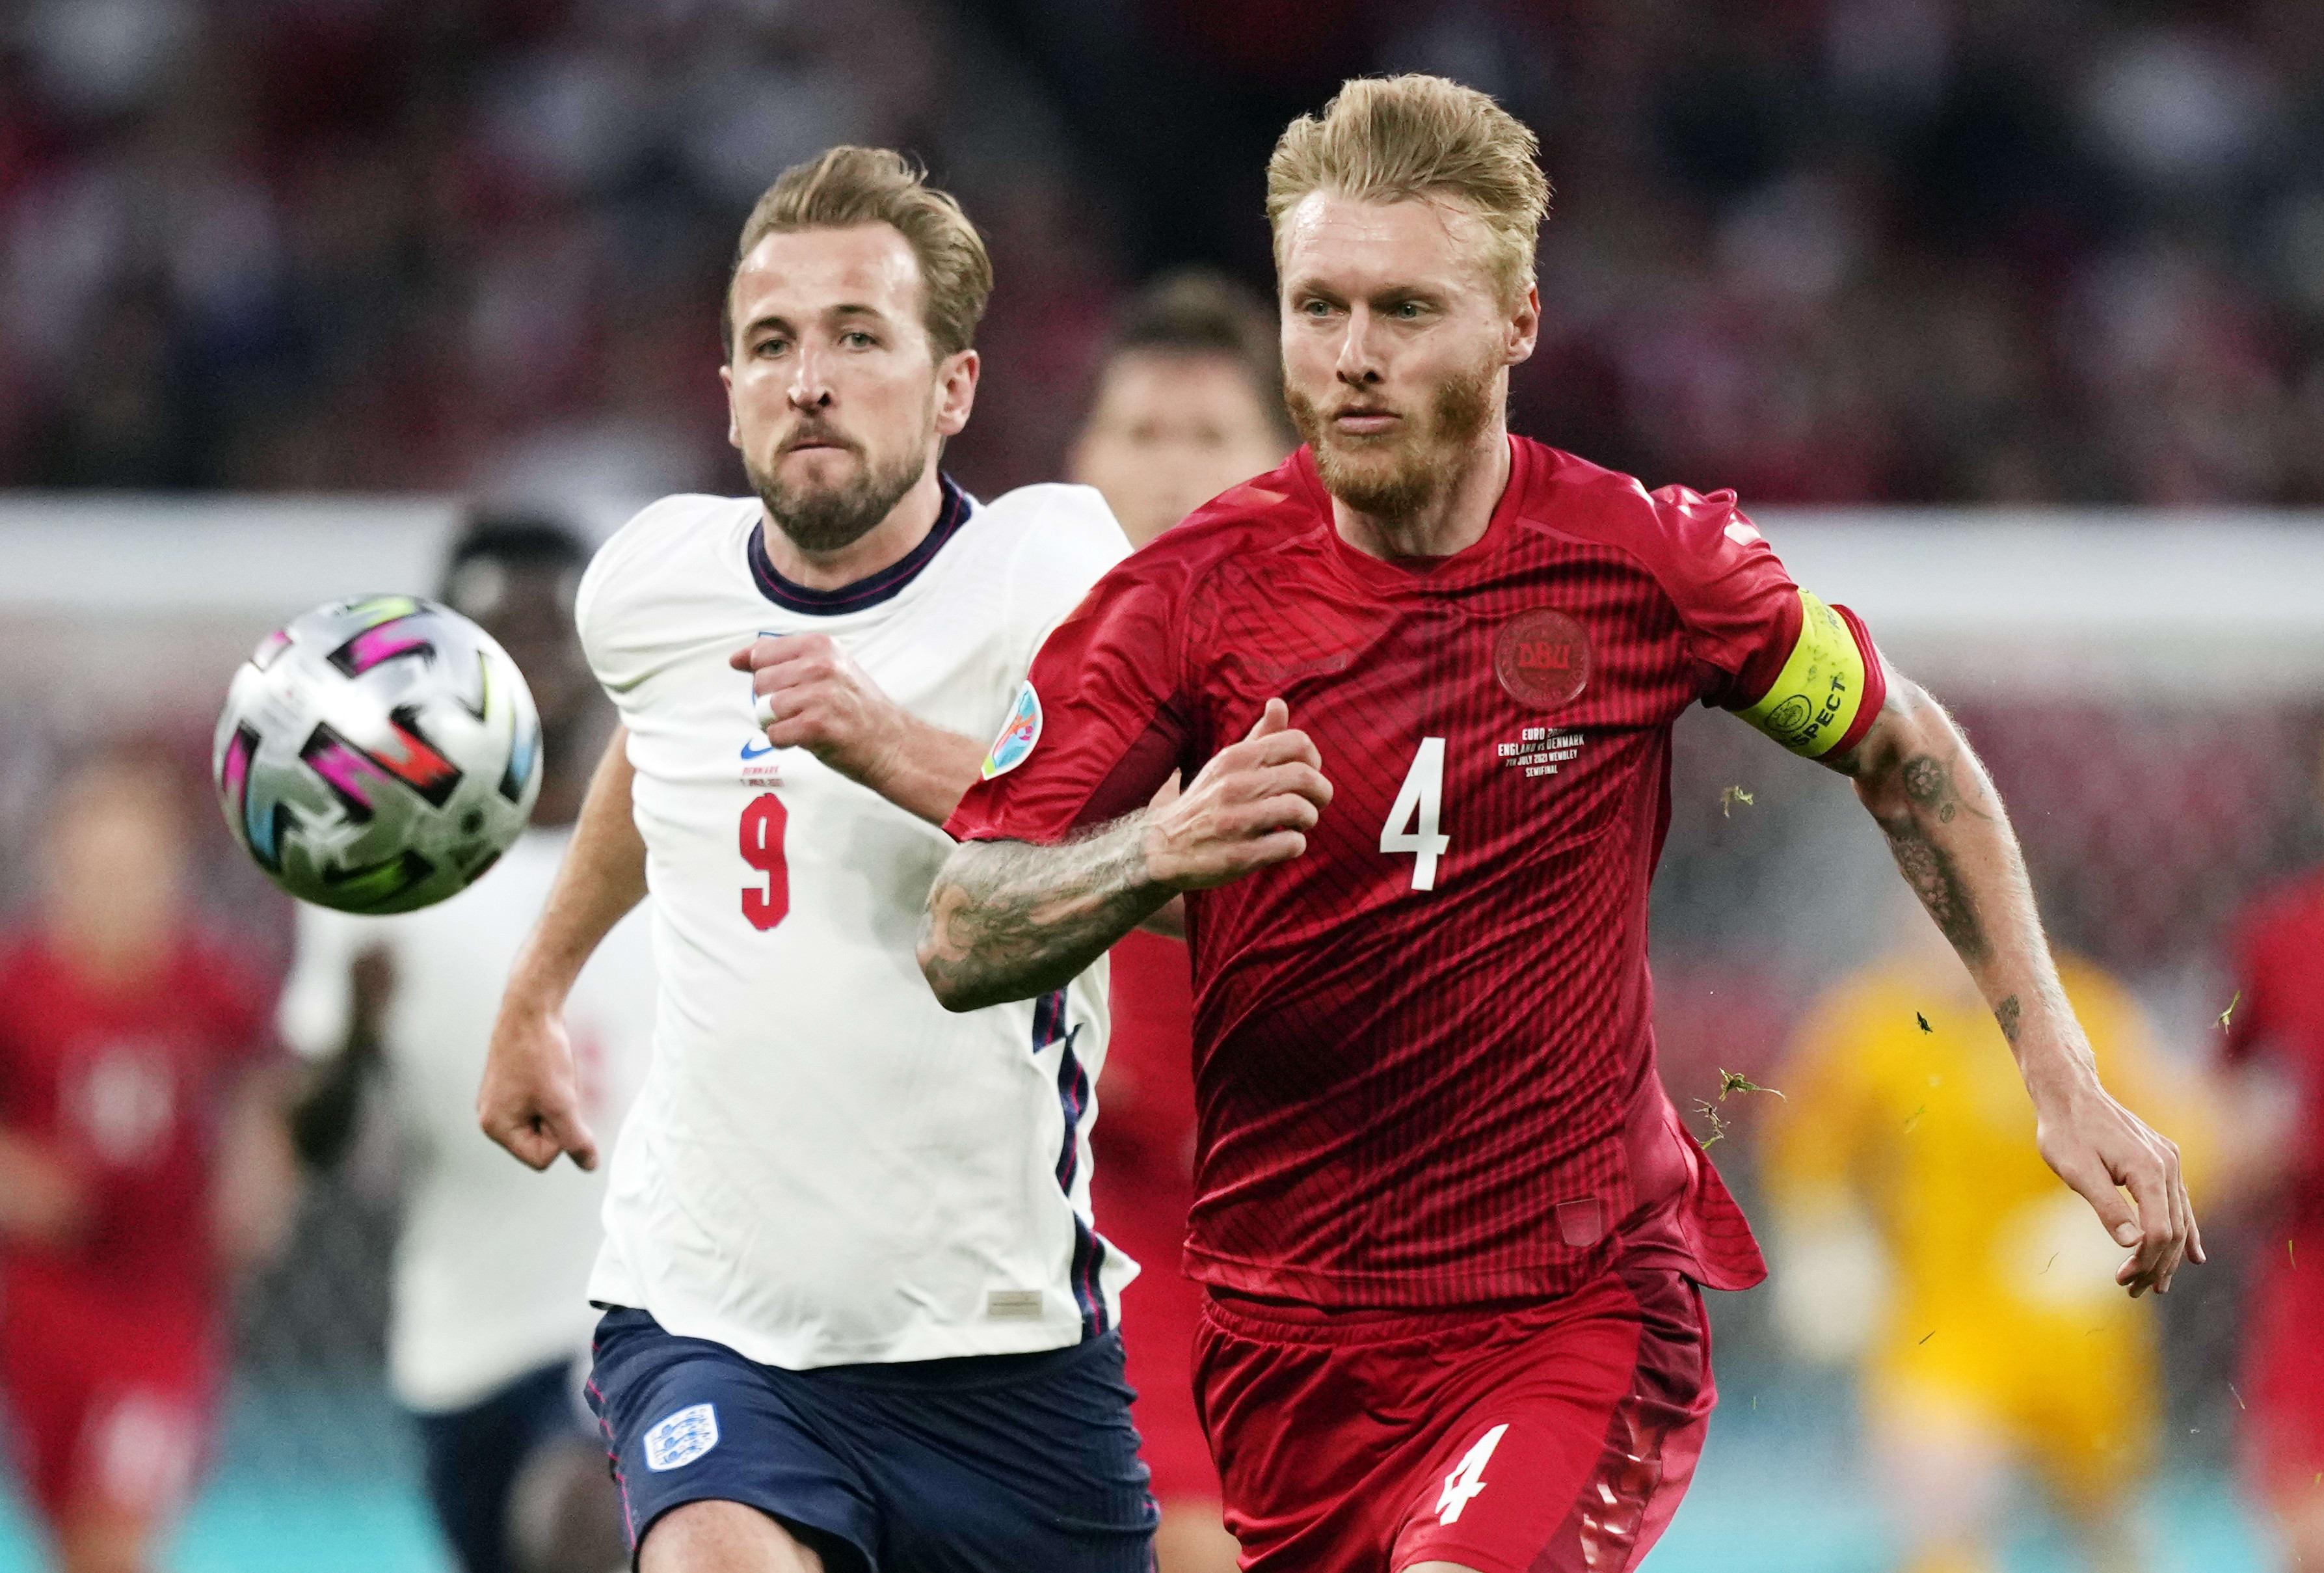 Simon Kiar Denmark player vs. Harry Kane England player